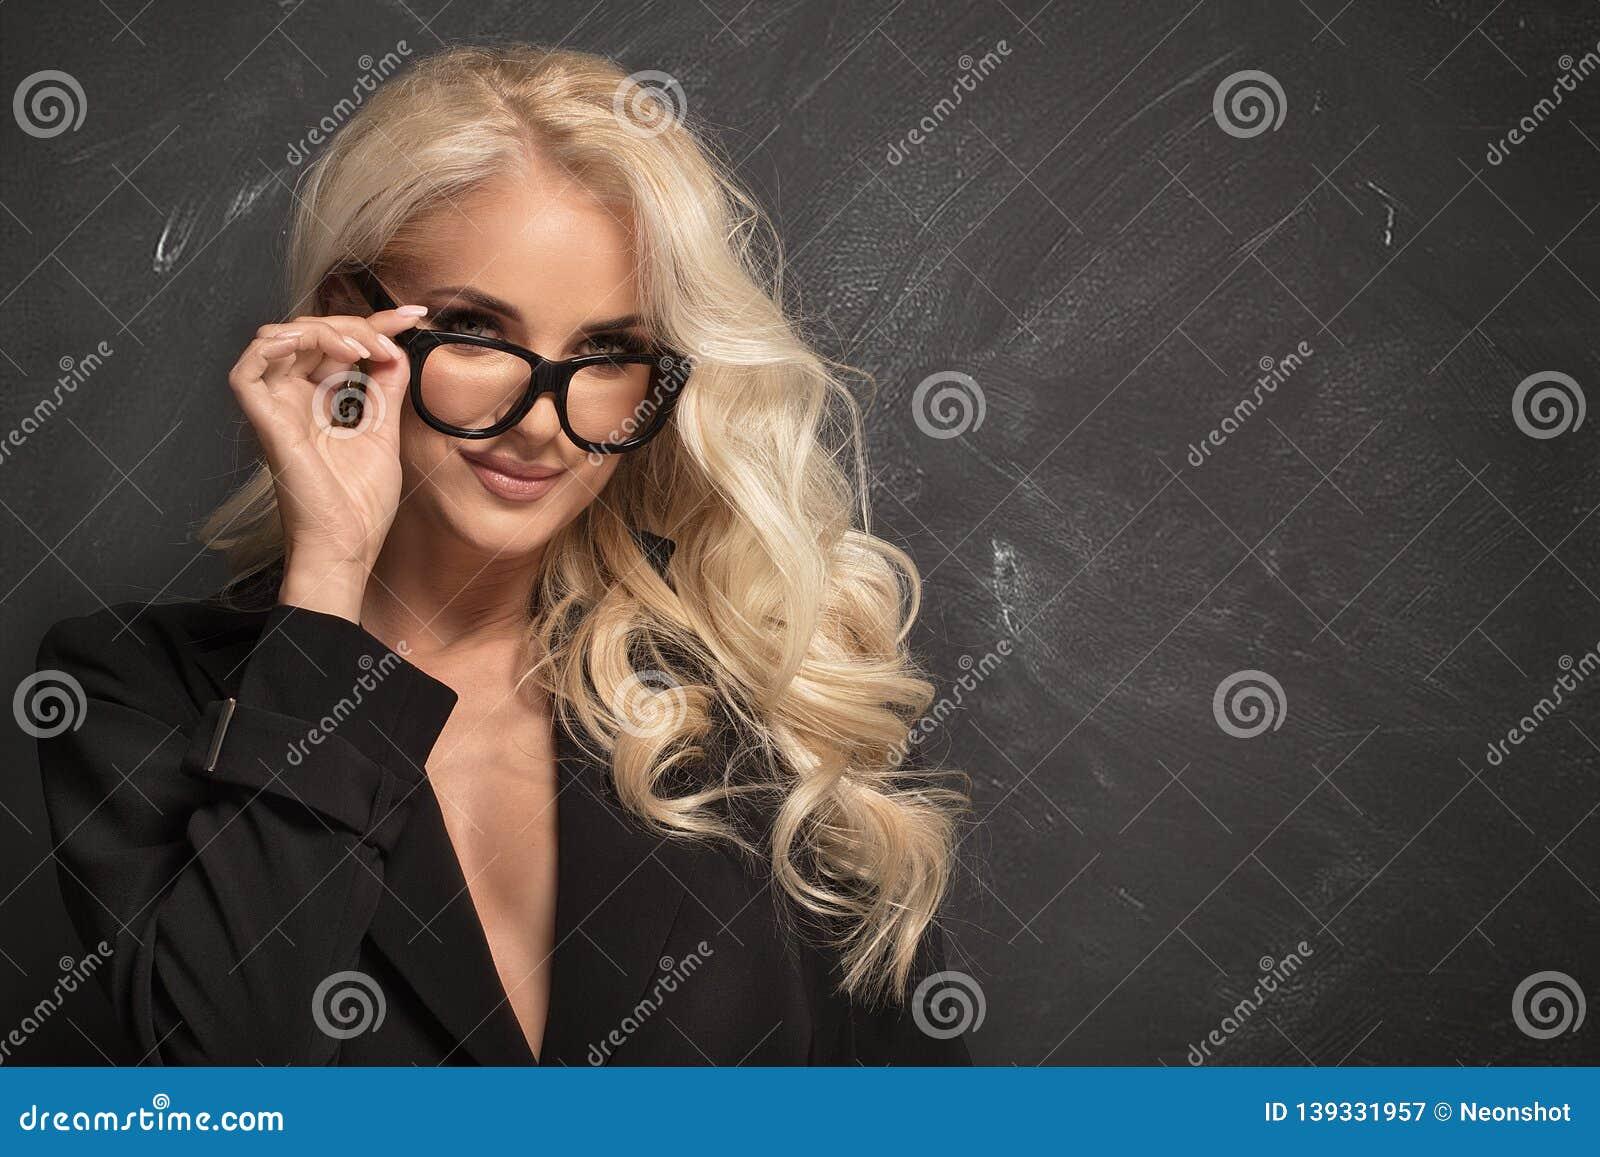 Long hair curly blonde secretary